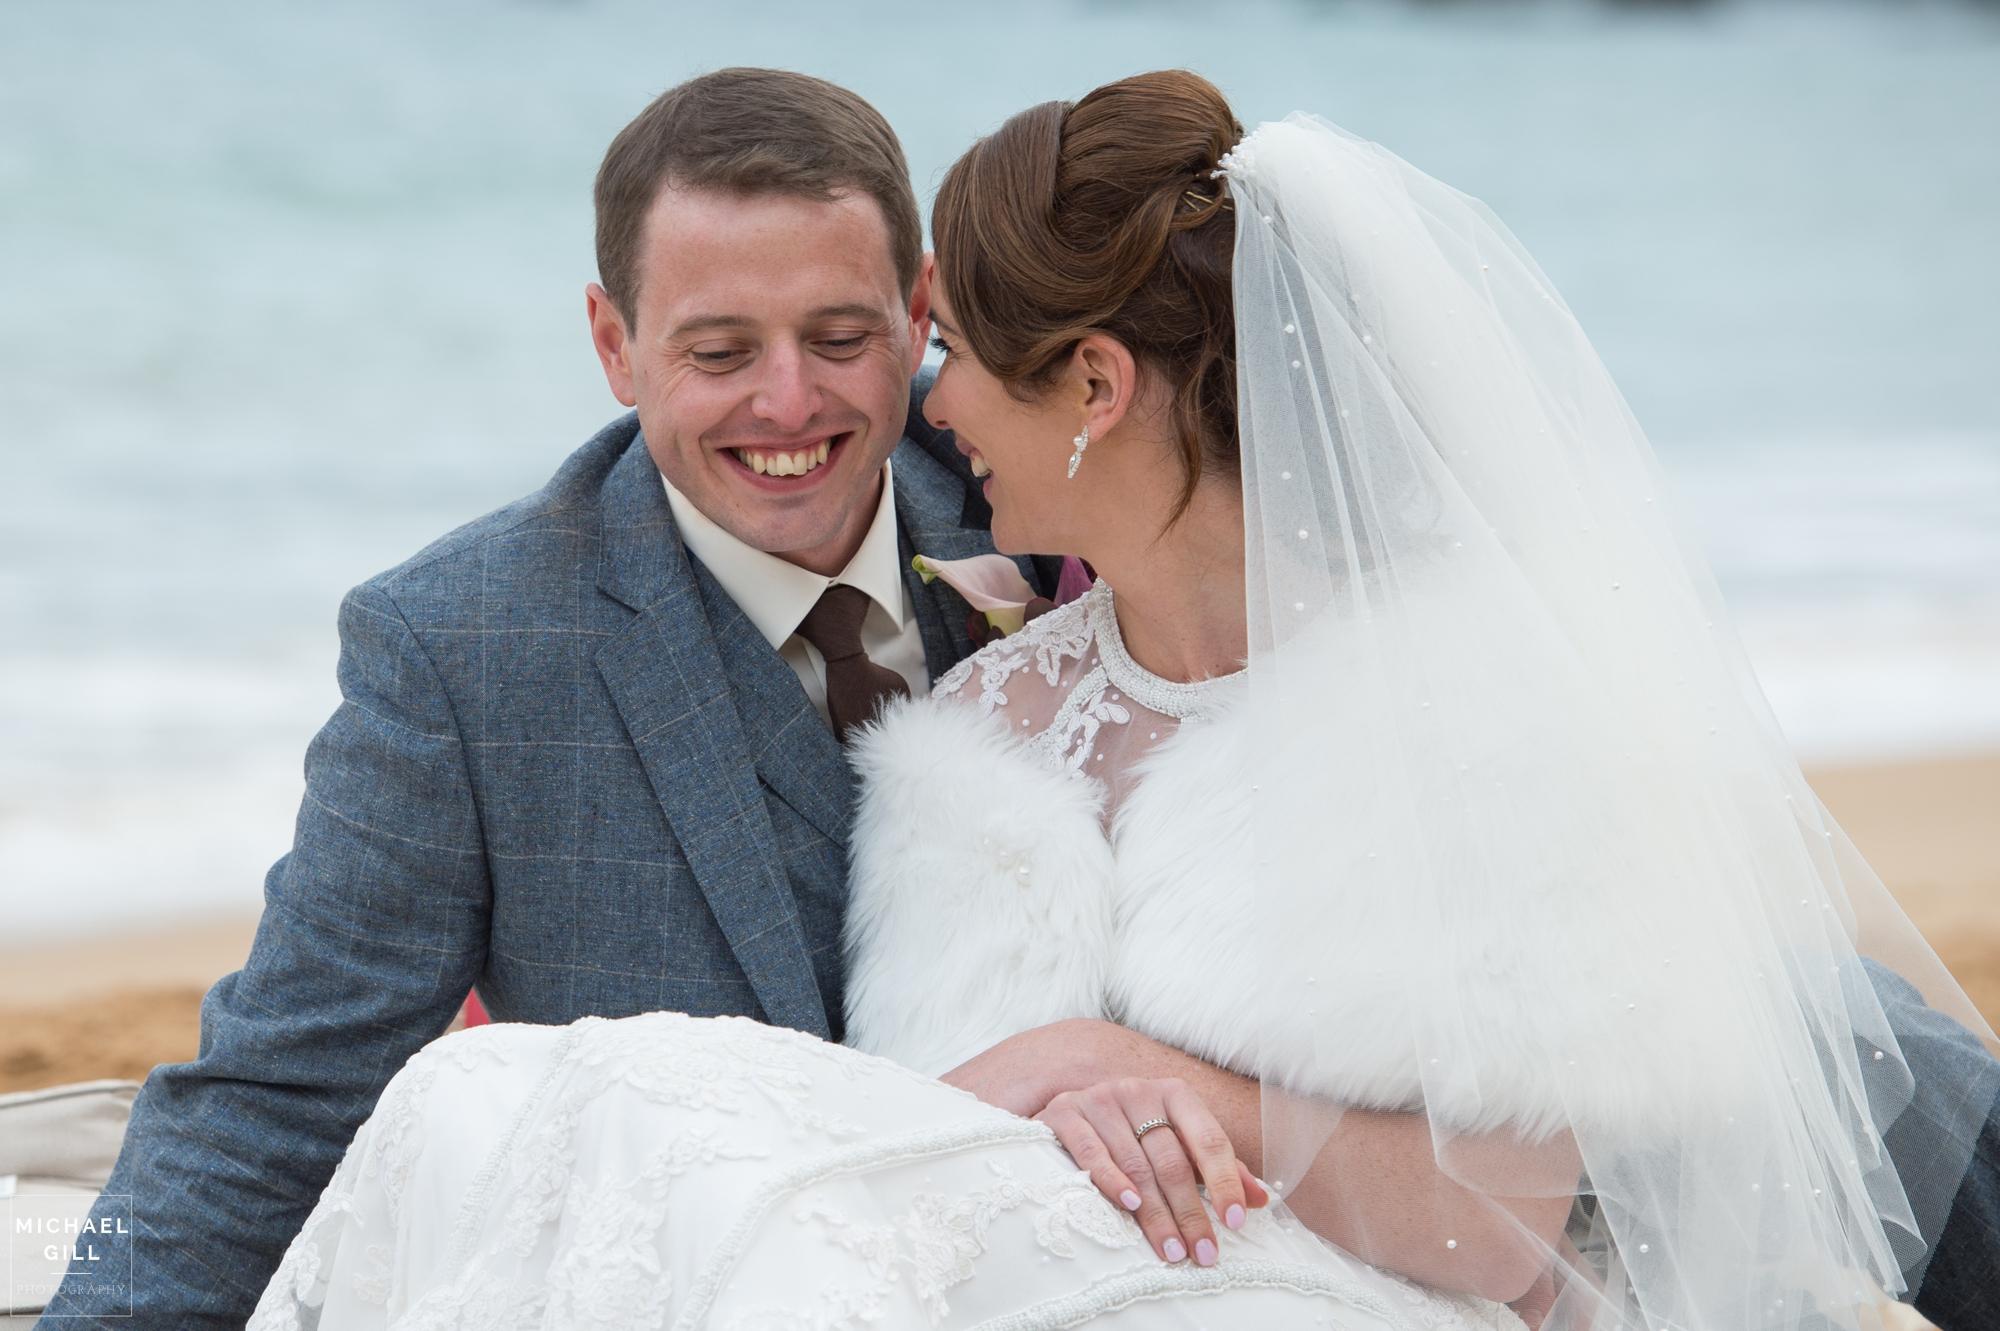 Michael_Gill_Photography_Kinnego_Redcastle_Hotel_Wedding7 (1).jpg